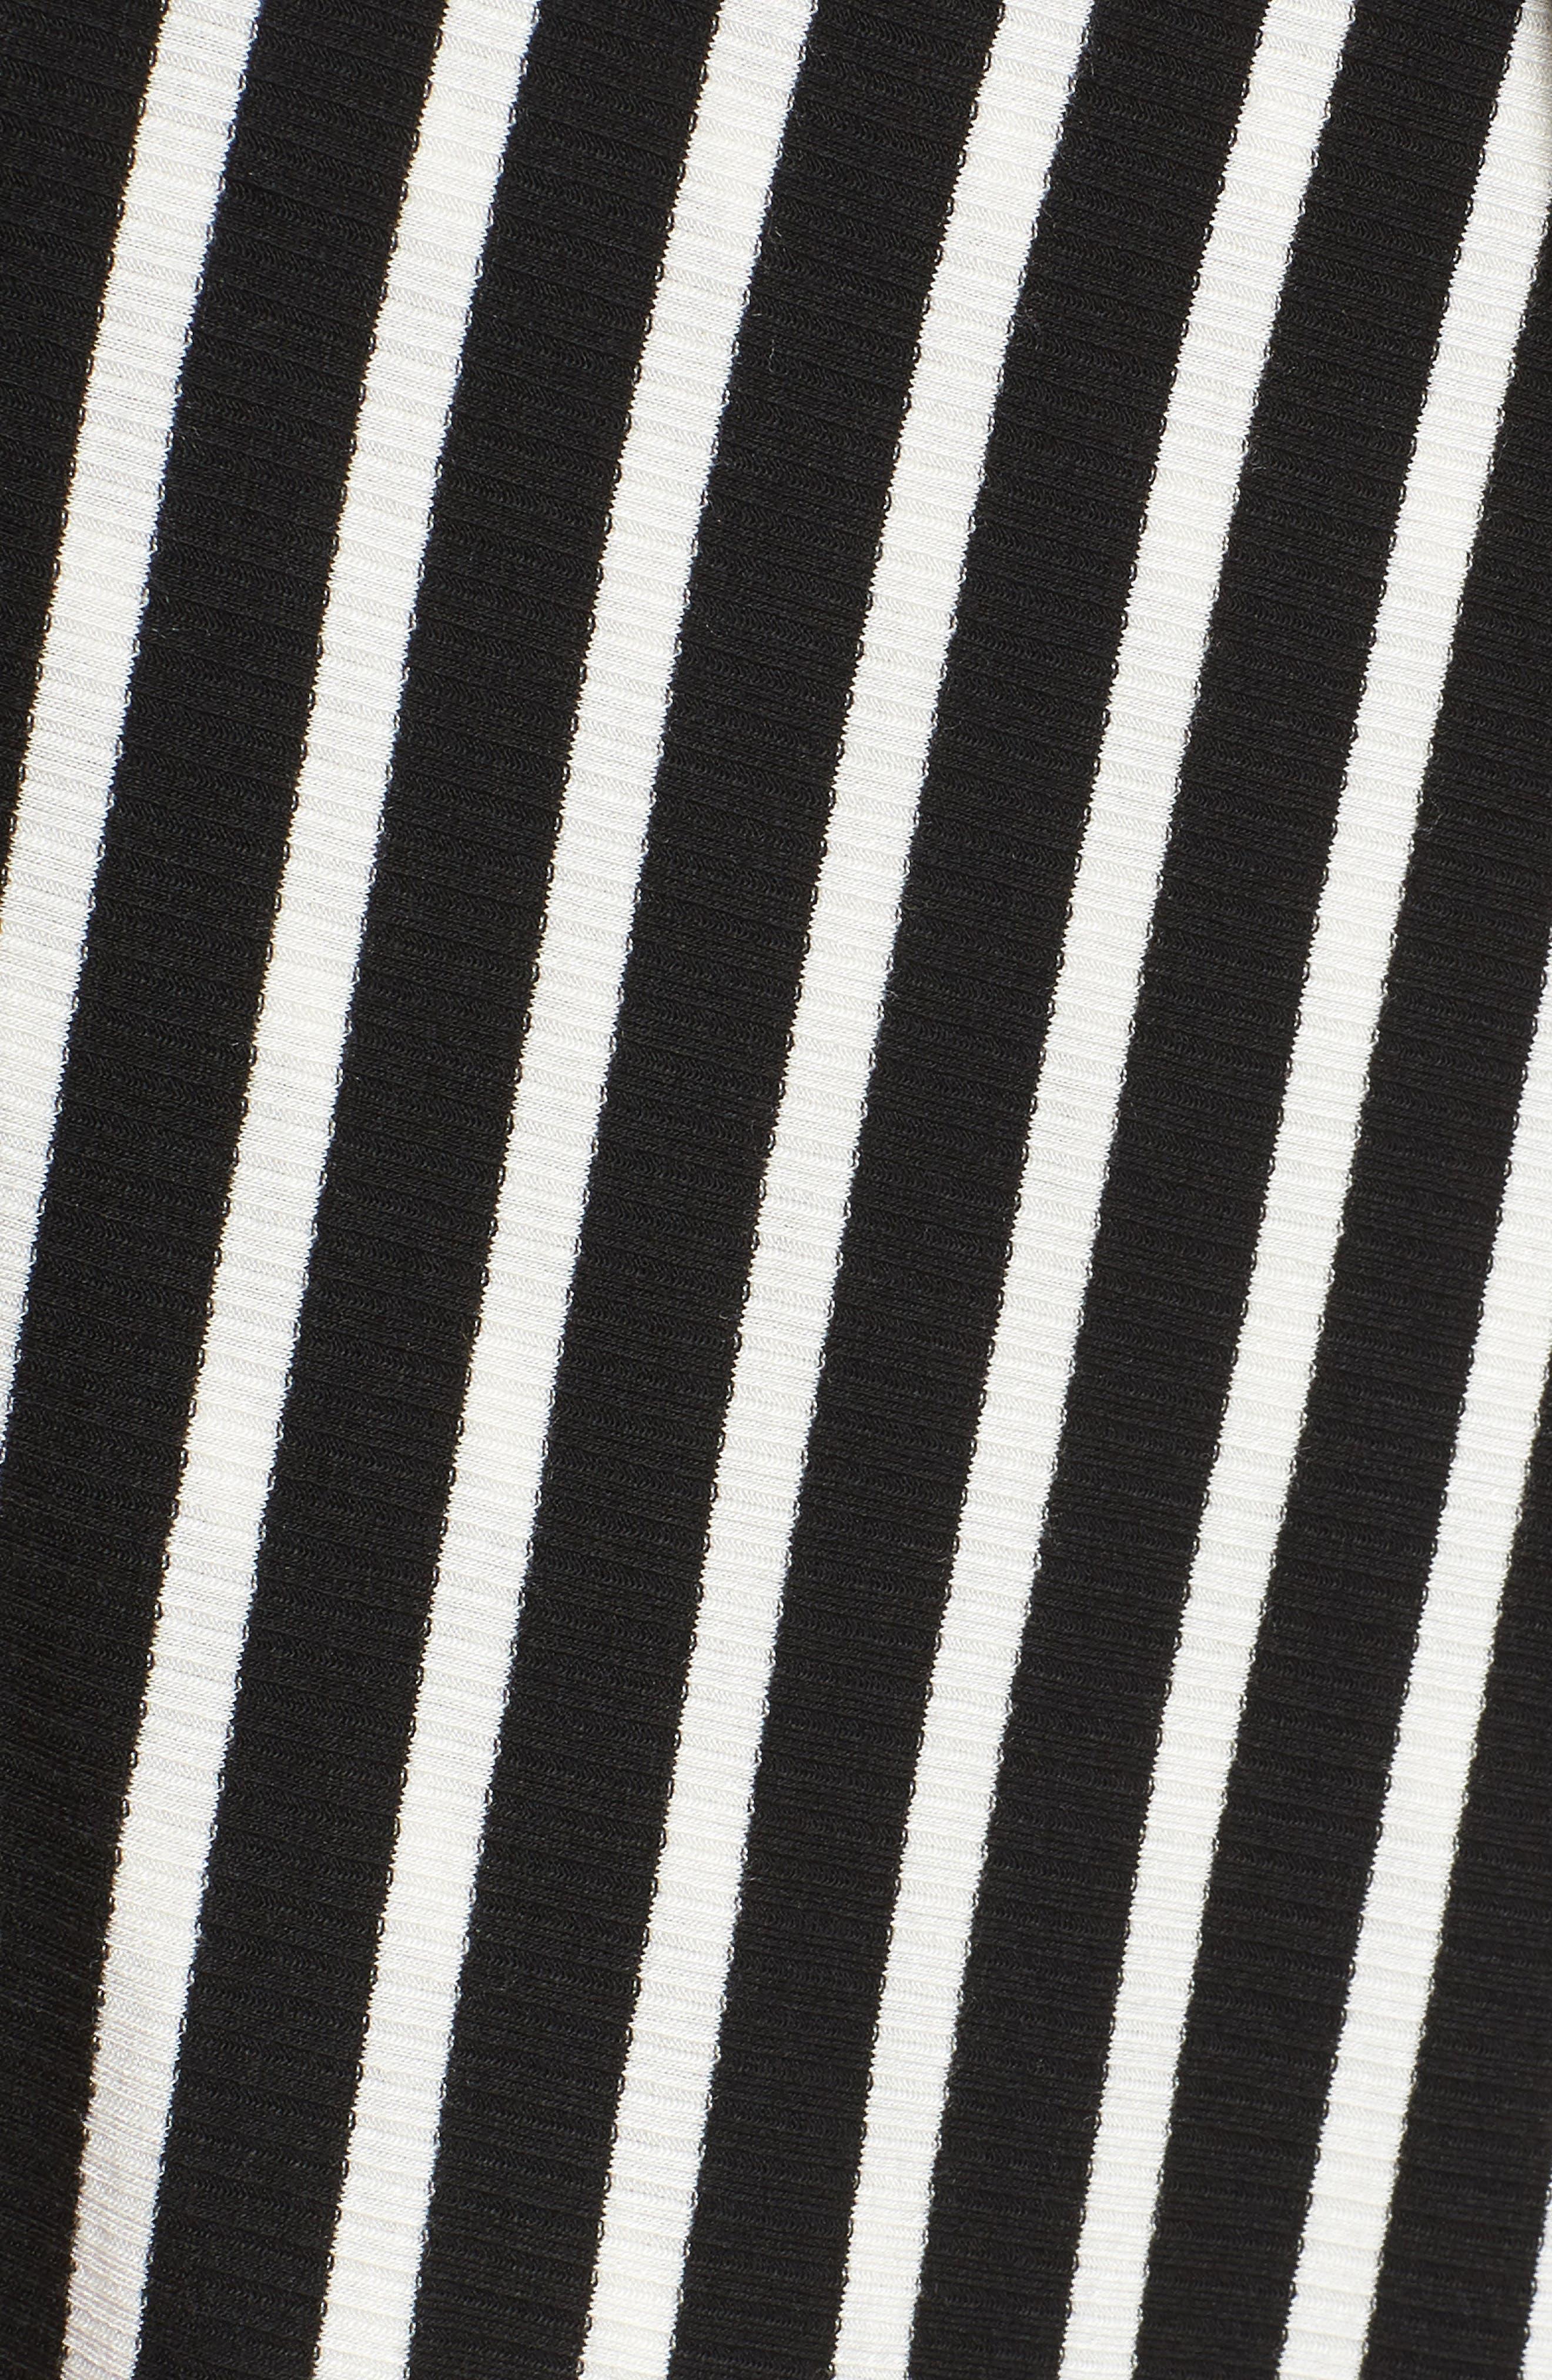 Ribbed Stripe Wrap Dress,                             Alternate thumbnail 5, color,                             Black/ White Stripe